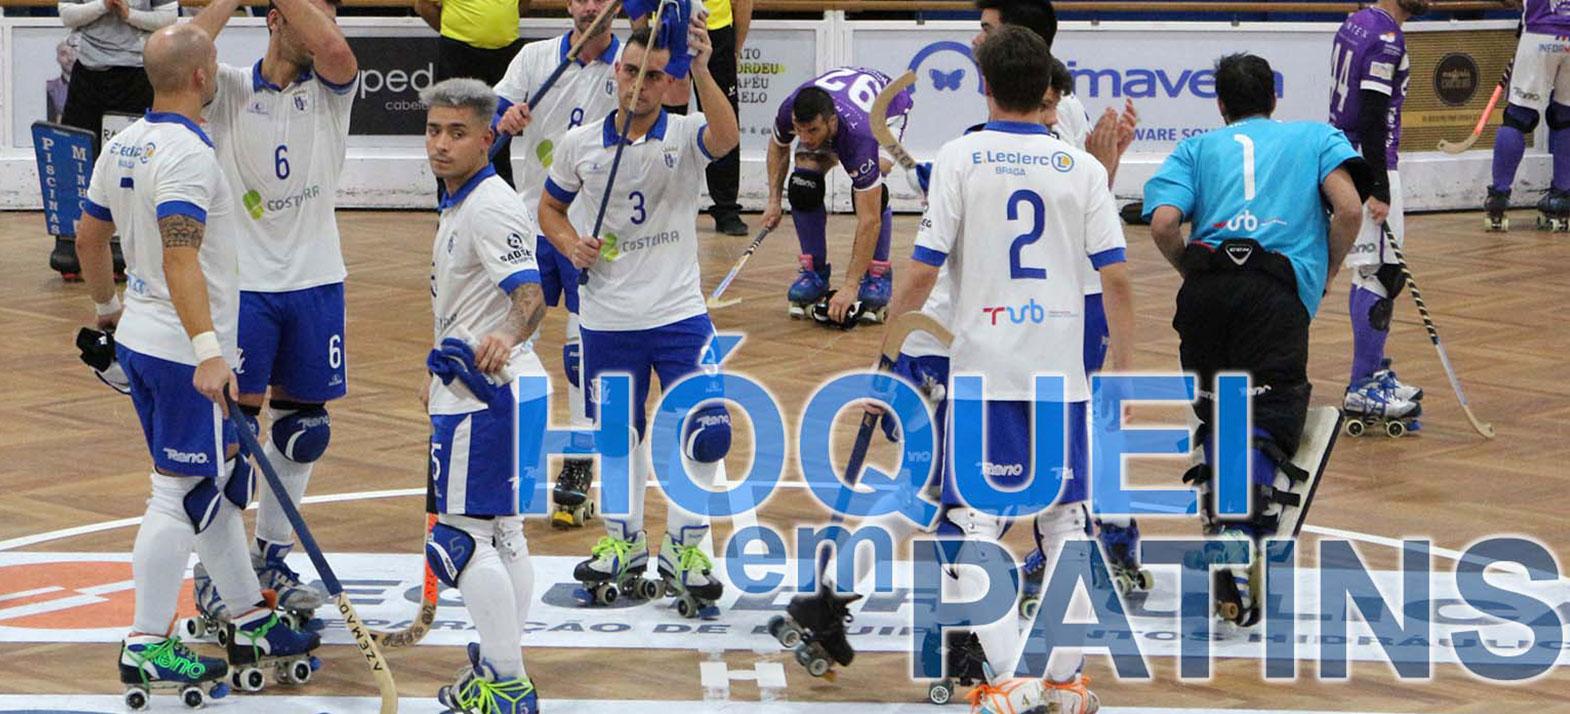 Hóquei Clube de Braga